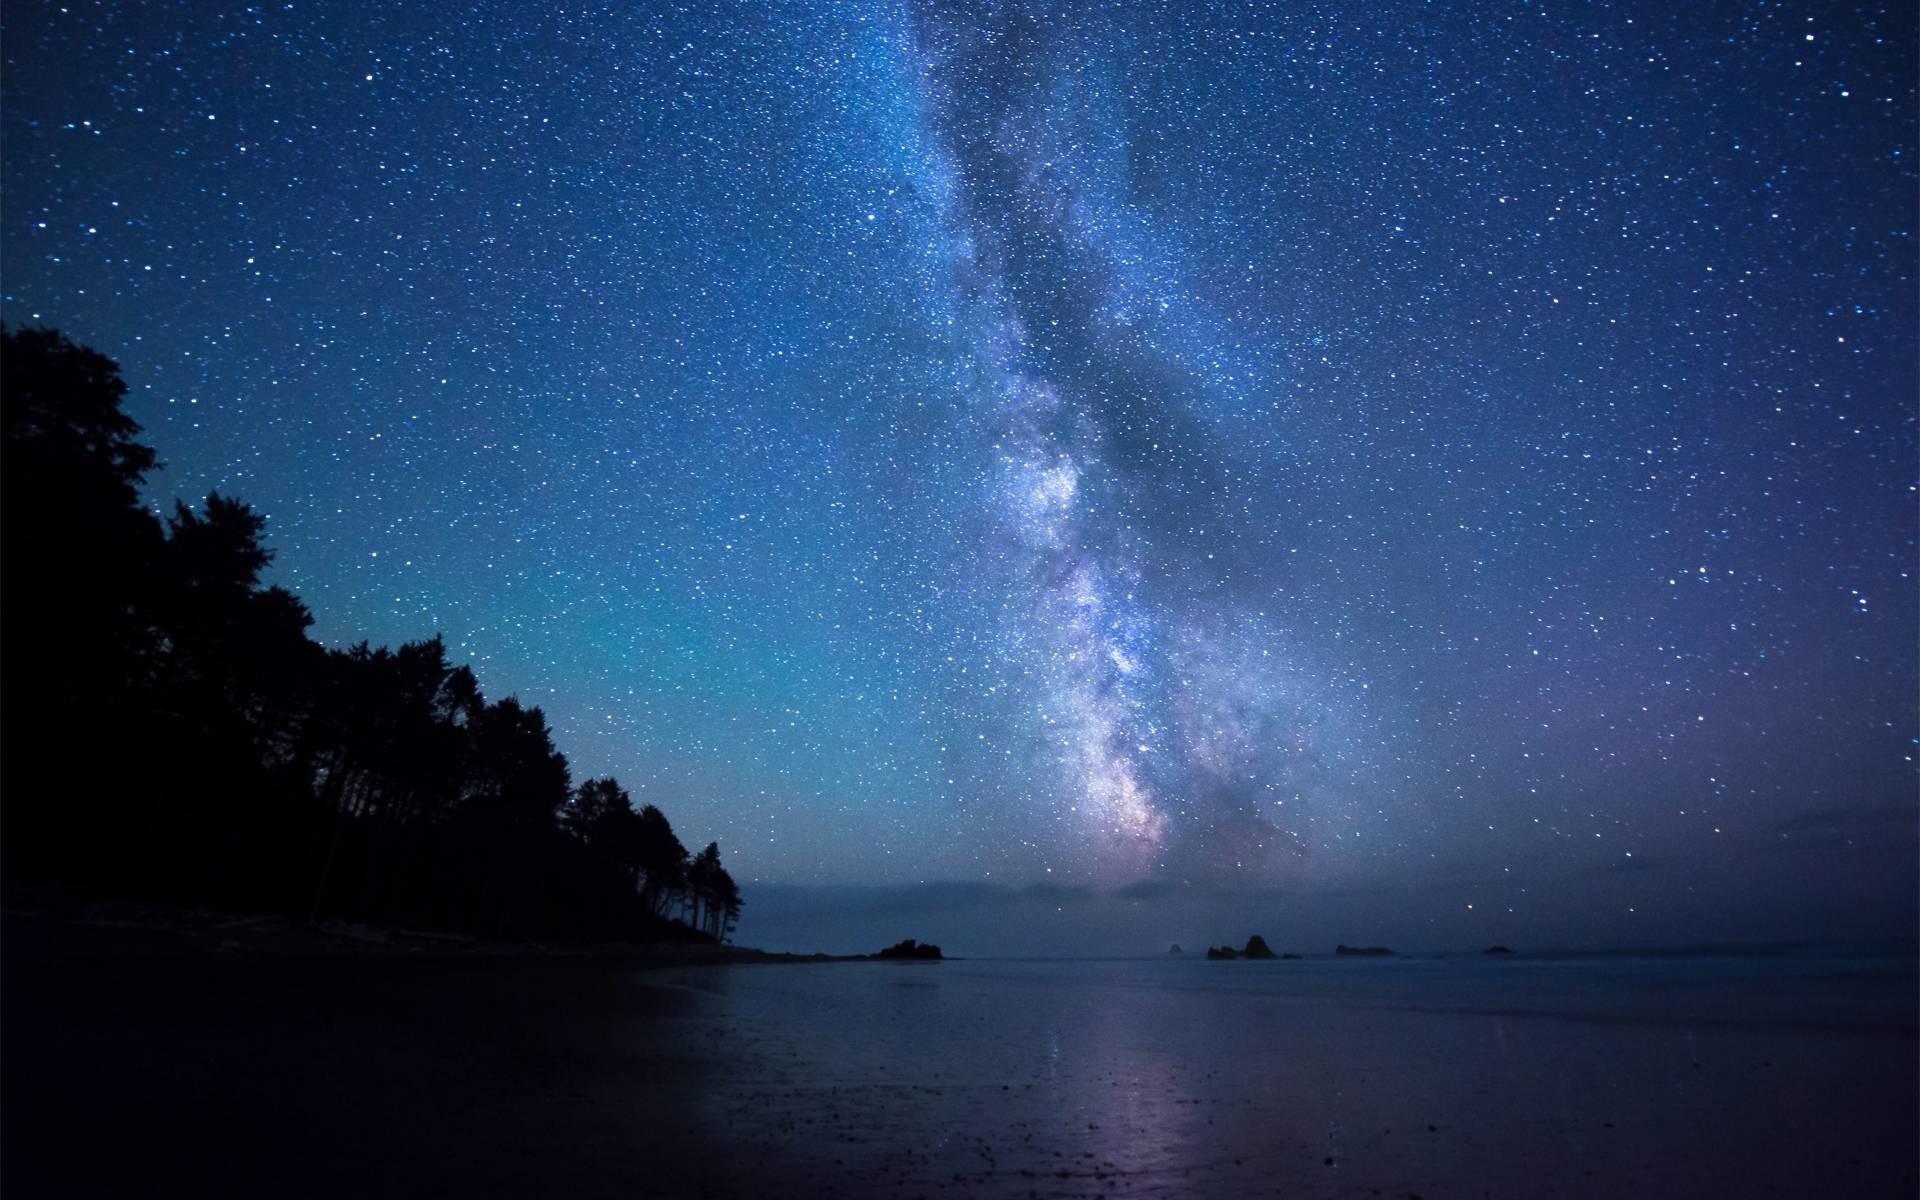 Night Sky Stars Wallpapers Wallpaper